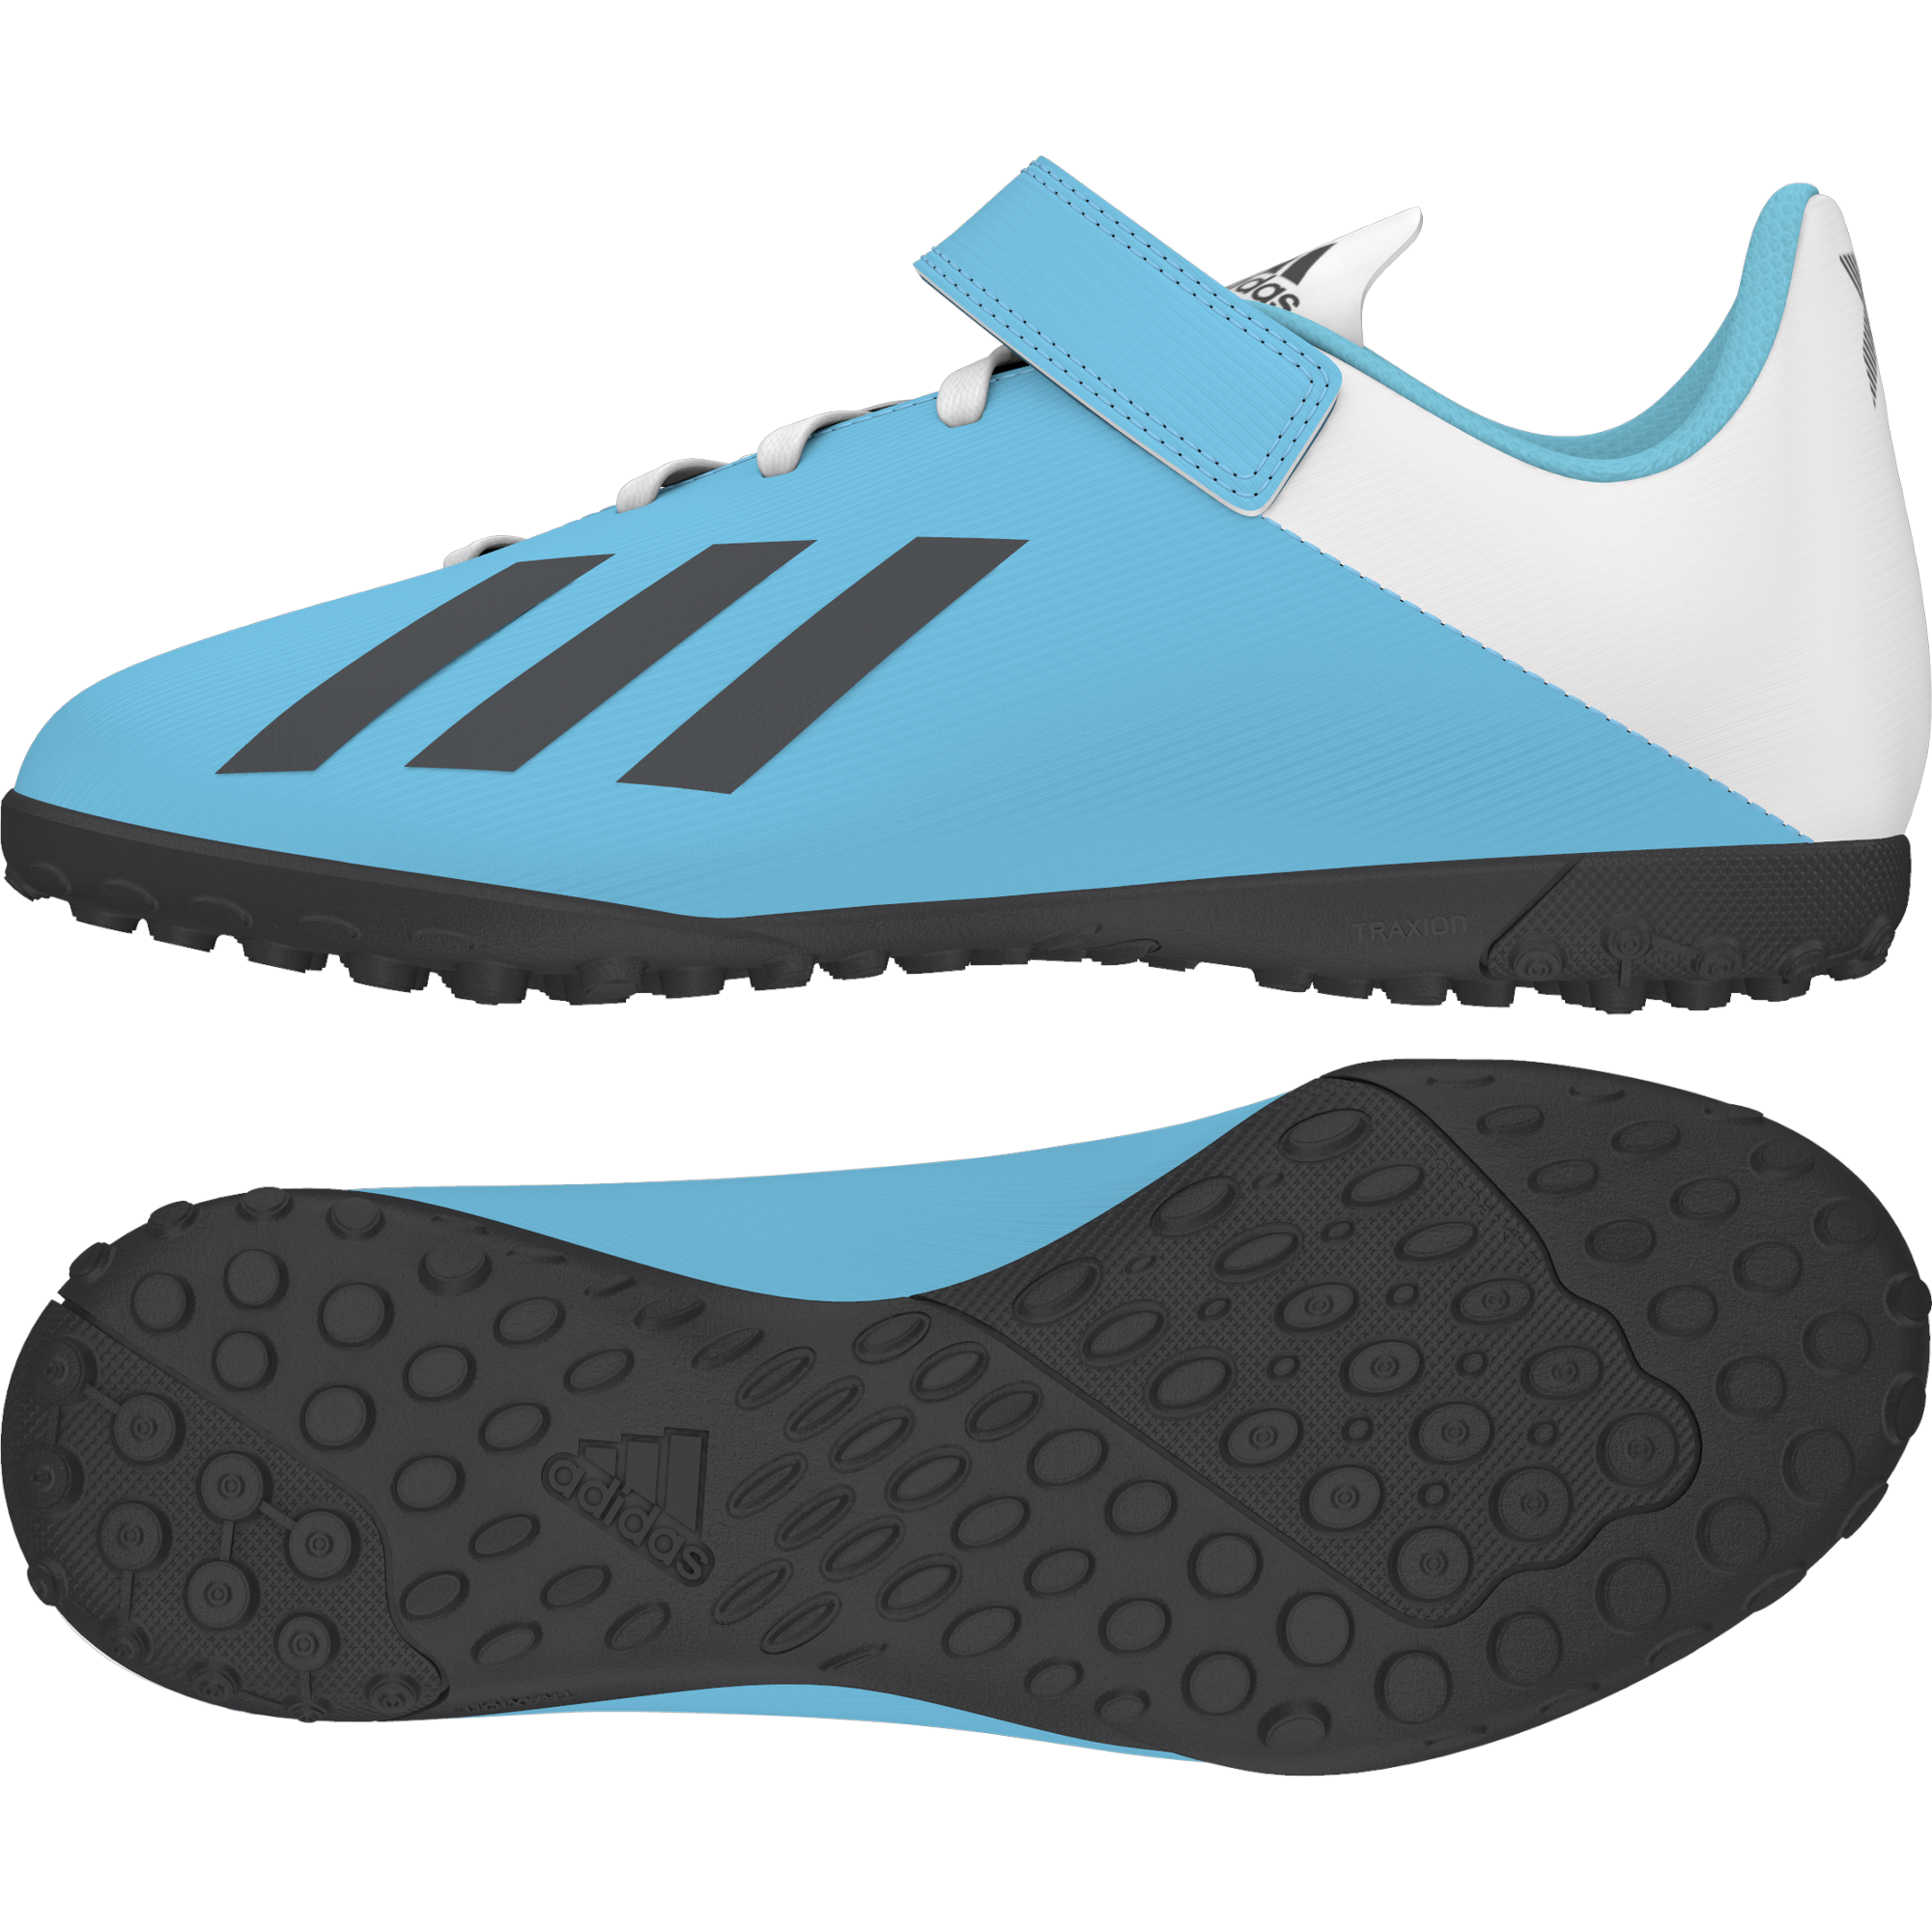 Adidas X 19 4 Kunstrasen Fussballschuhe Fur Kinder